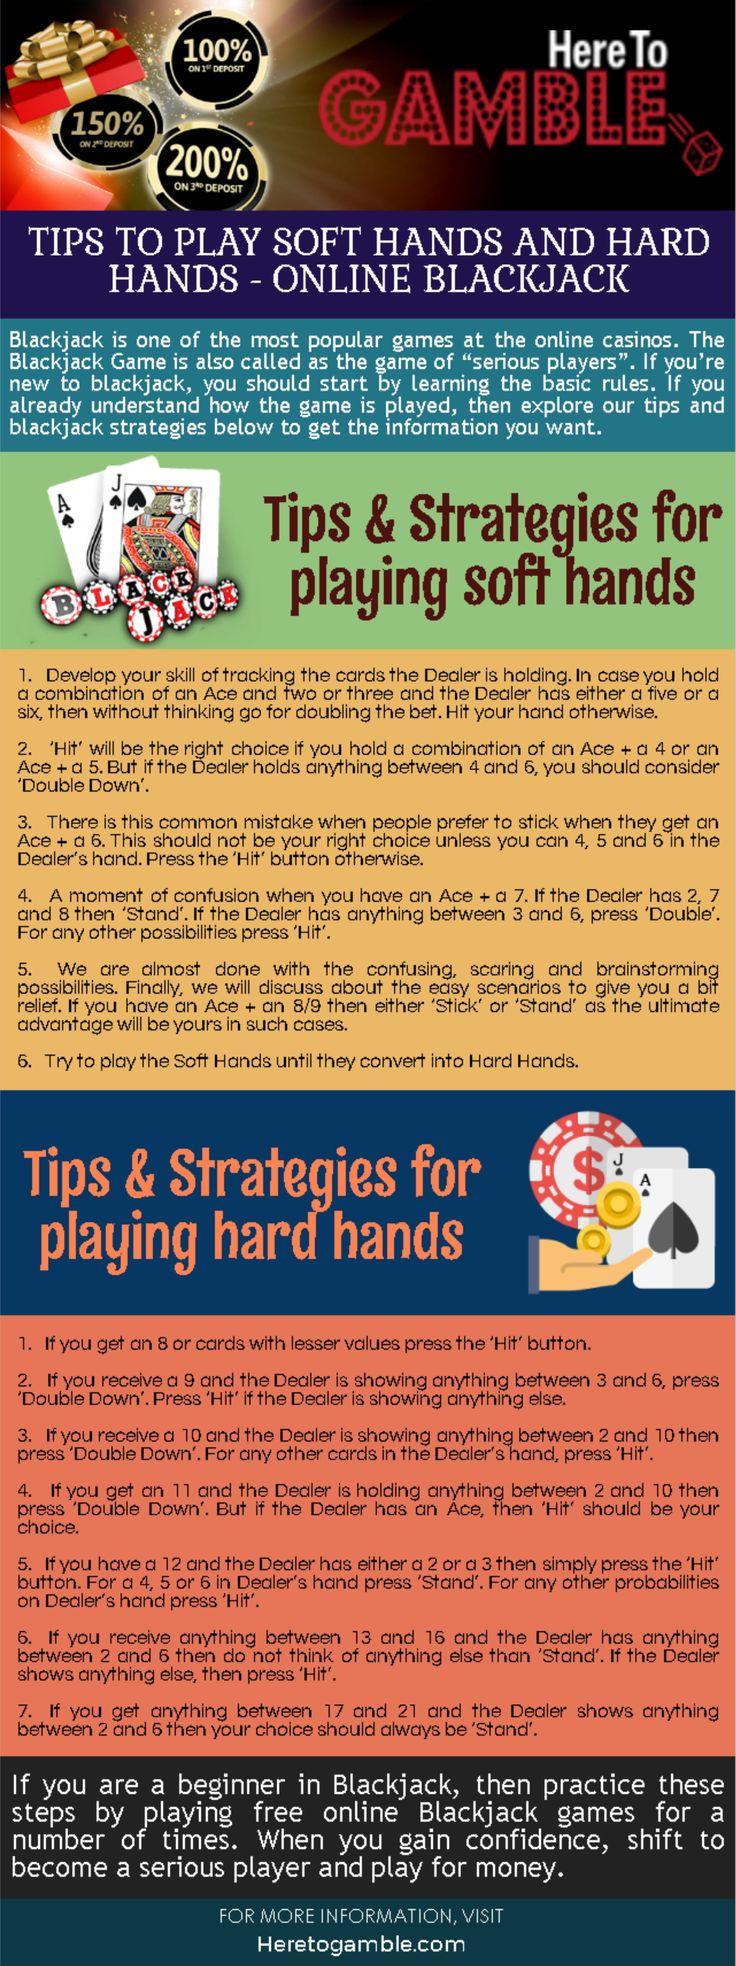 4 online gambling casinos ca casino diego san viejas